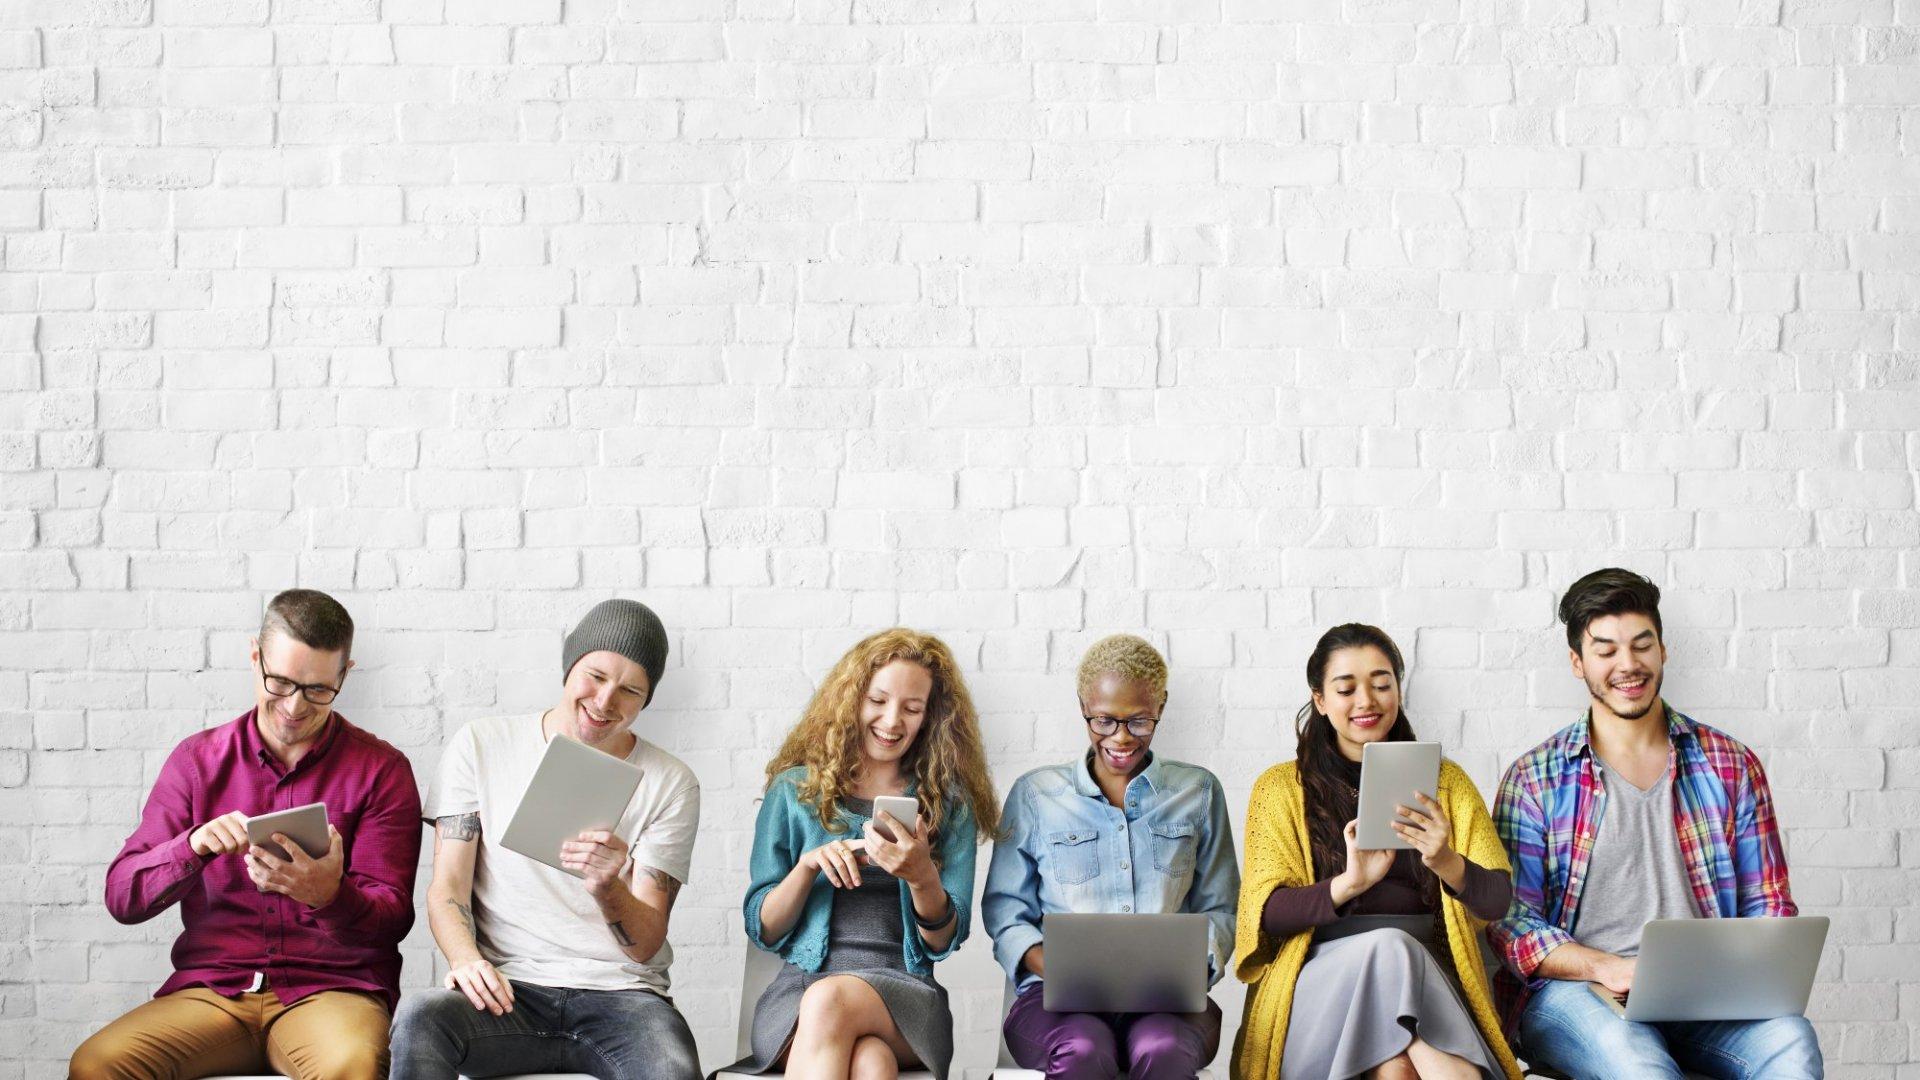 5 Ways Companies Need to Market to Millennials in 2017